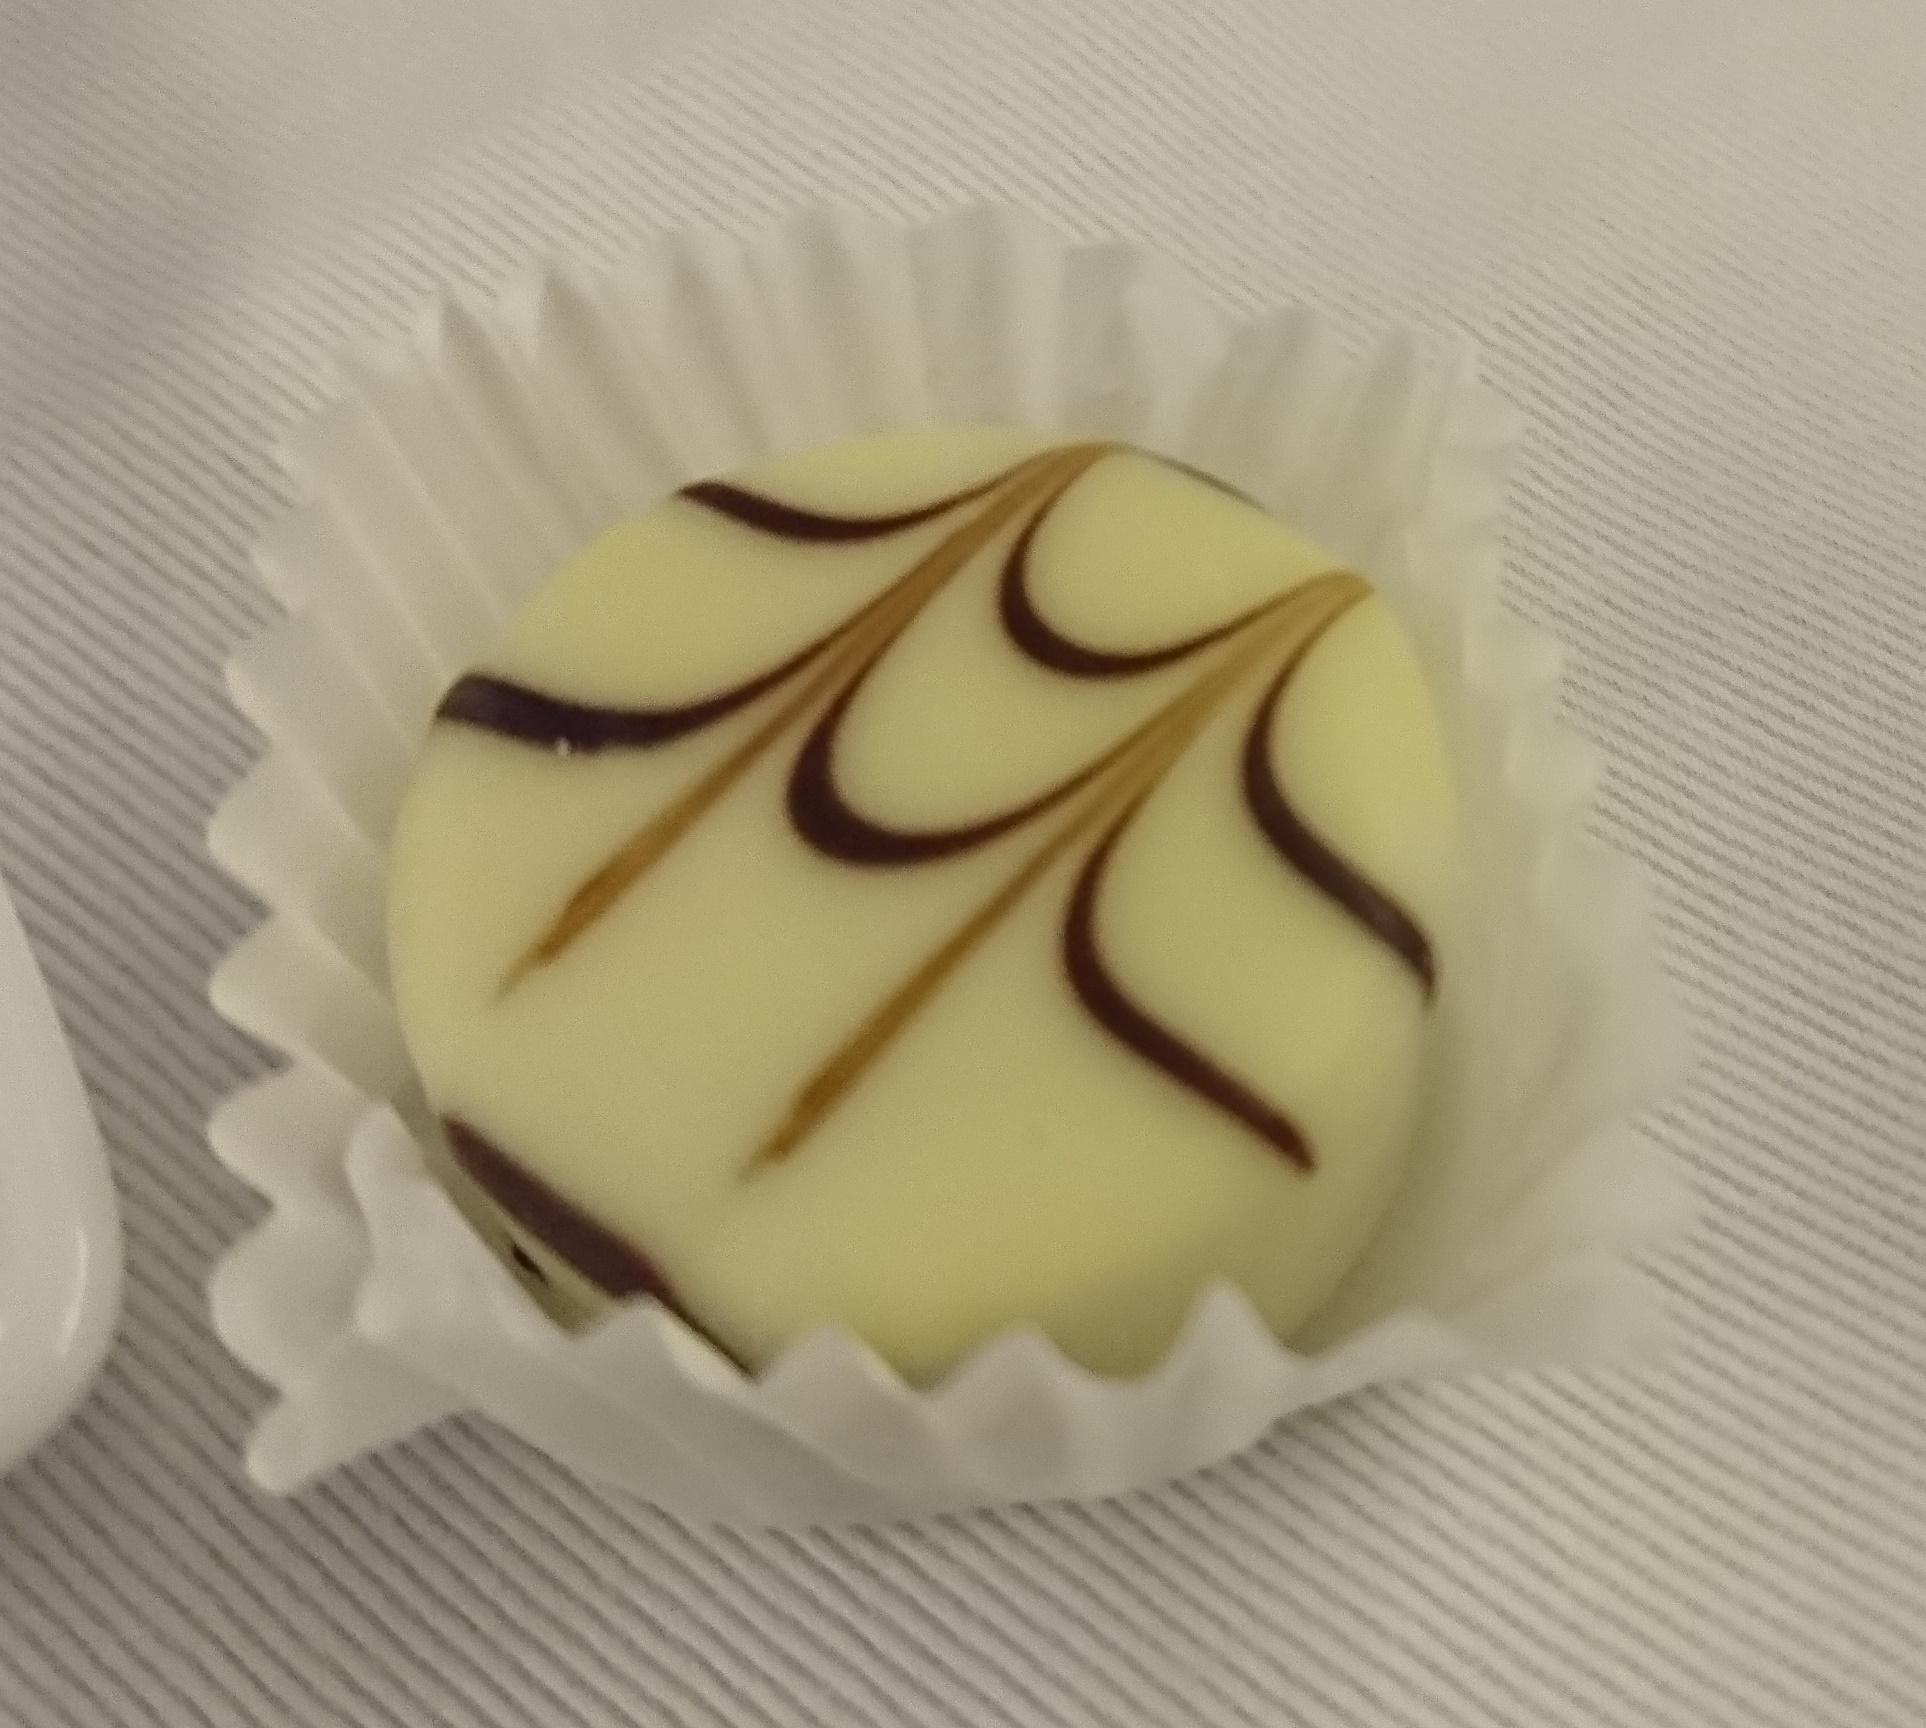 ANAビジネスクラスで出されたチョコレート